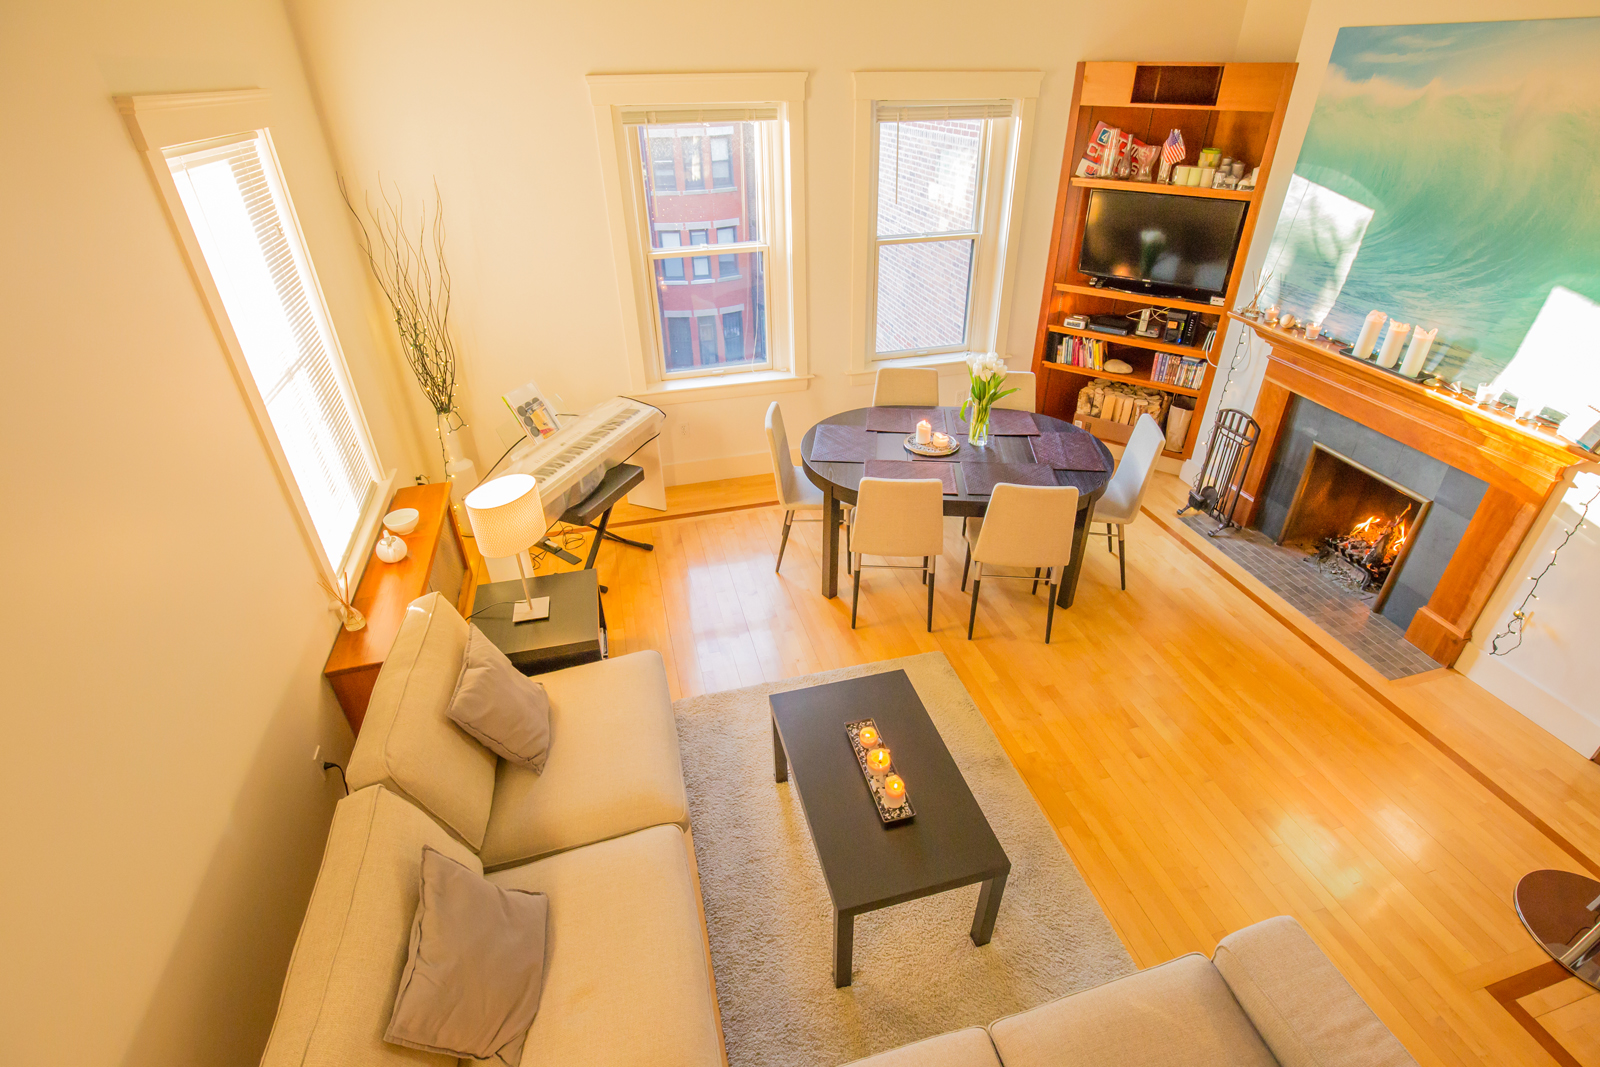 Condominium for Sale at Pristine Penthouse Duplex 178 Commonwealth Ave. Unit PH 8 Back Bay, Boston, Massachusetts, 02116 United States